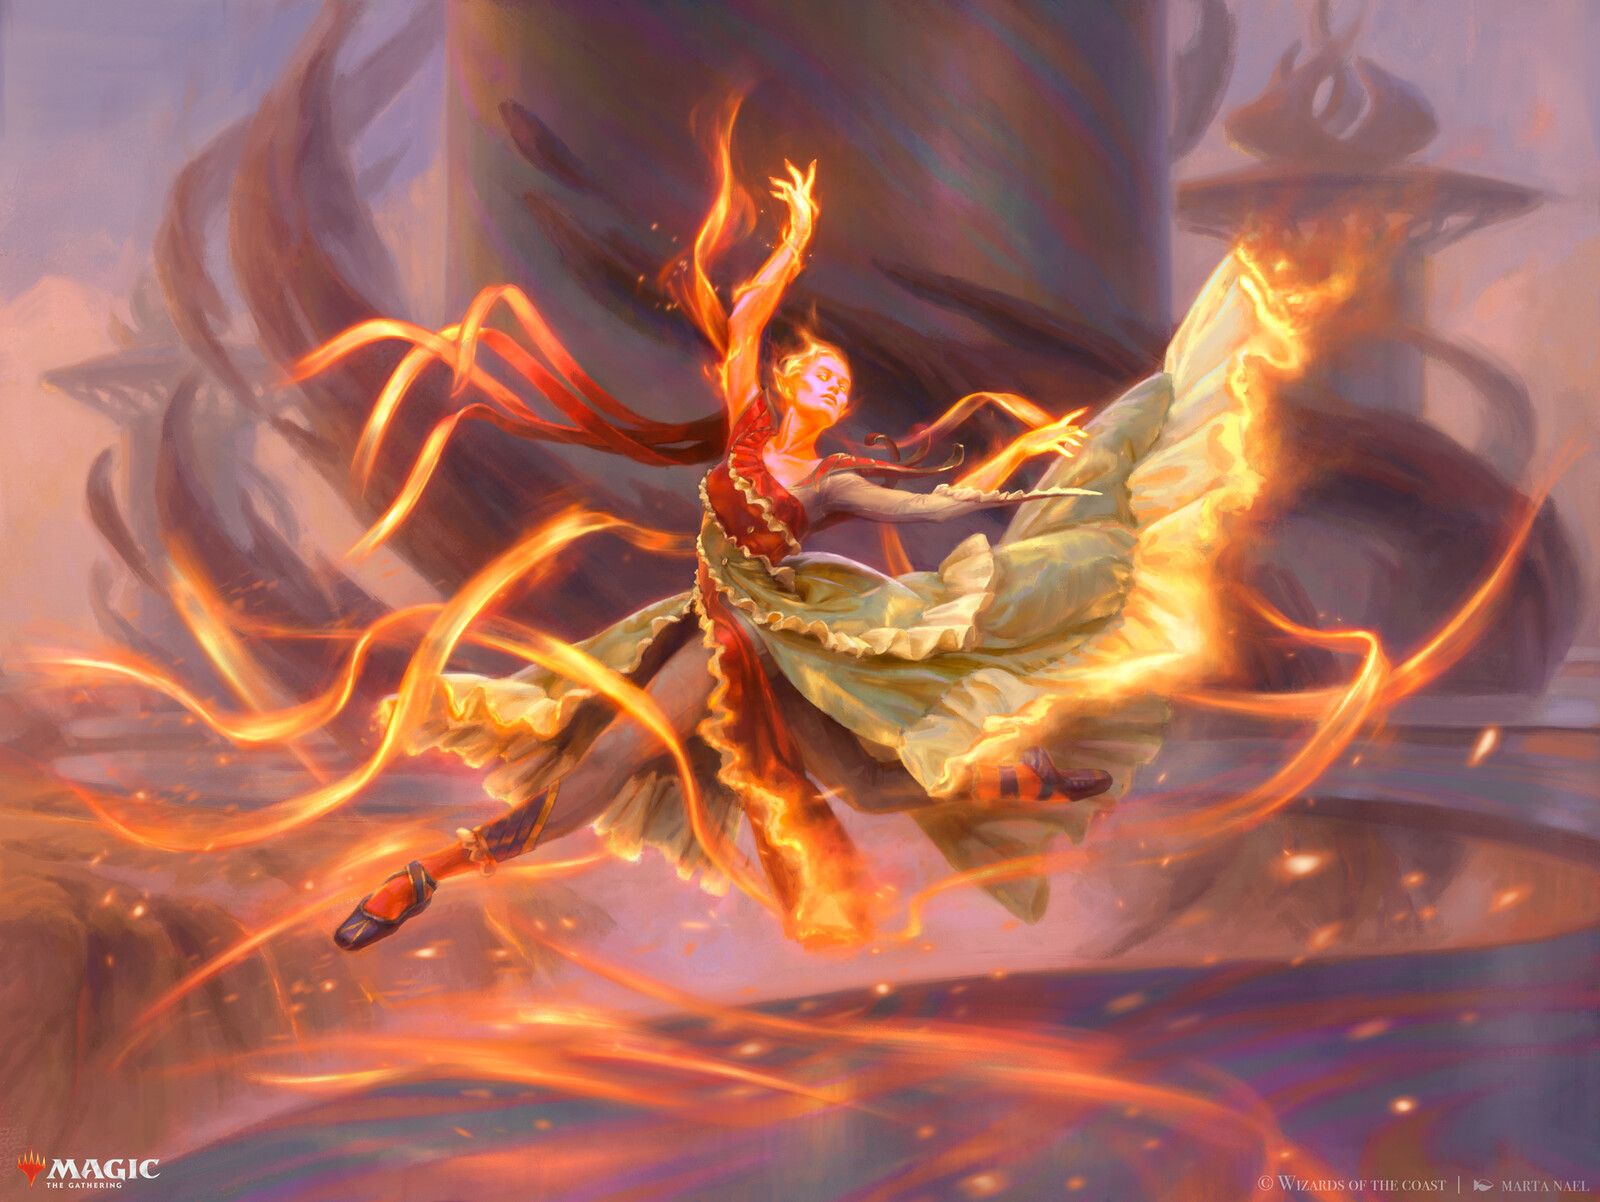 Magic: The Gathering - Efreet Flamepainter